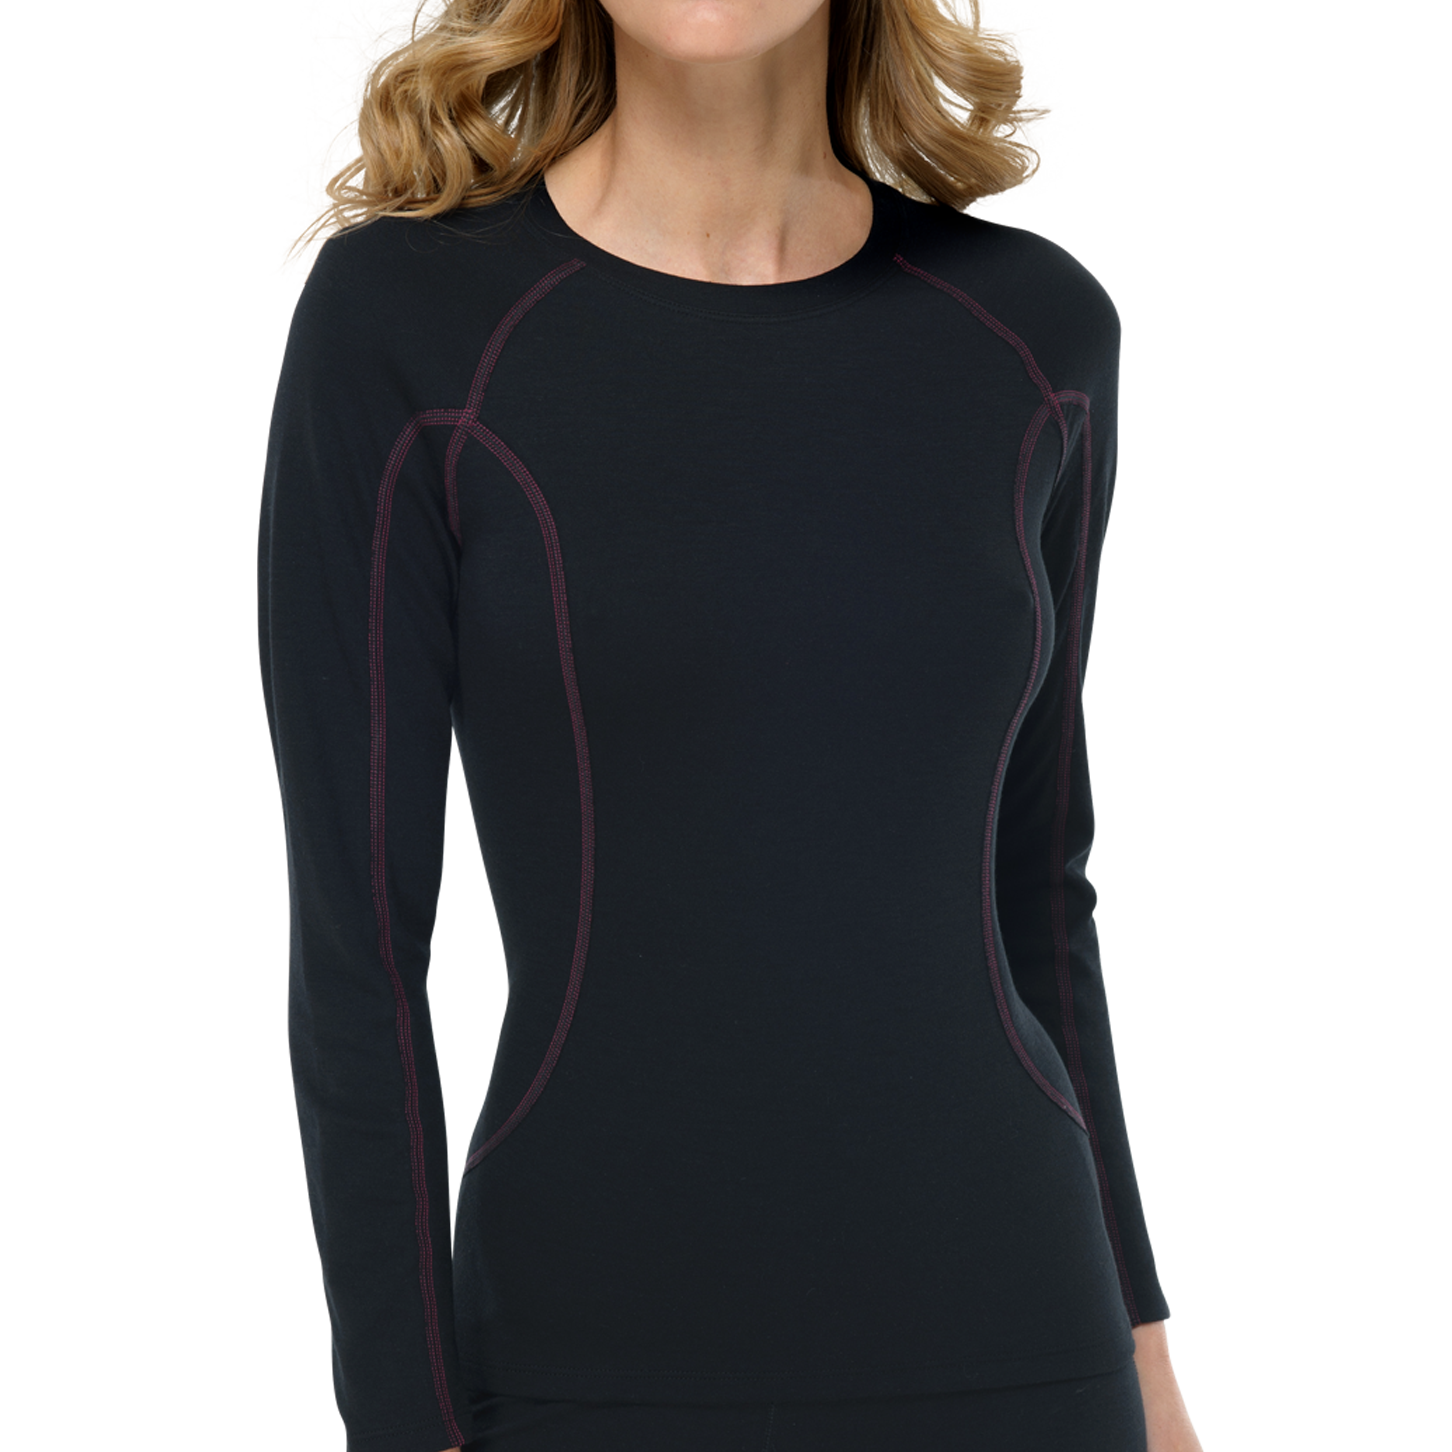 Thermo T-shirt met lange mouw 135302 - zwart-1